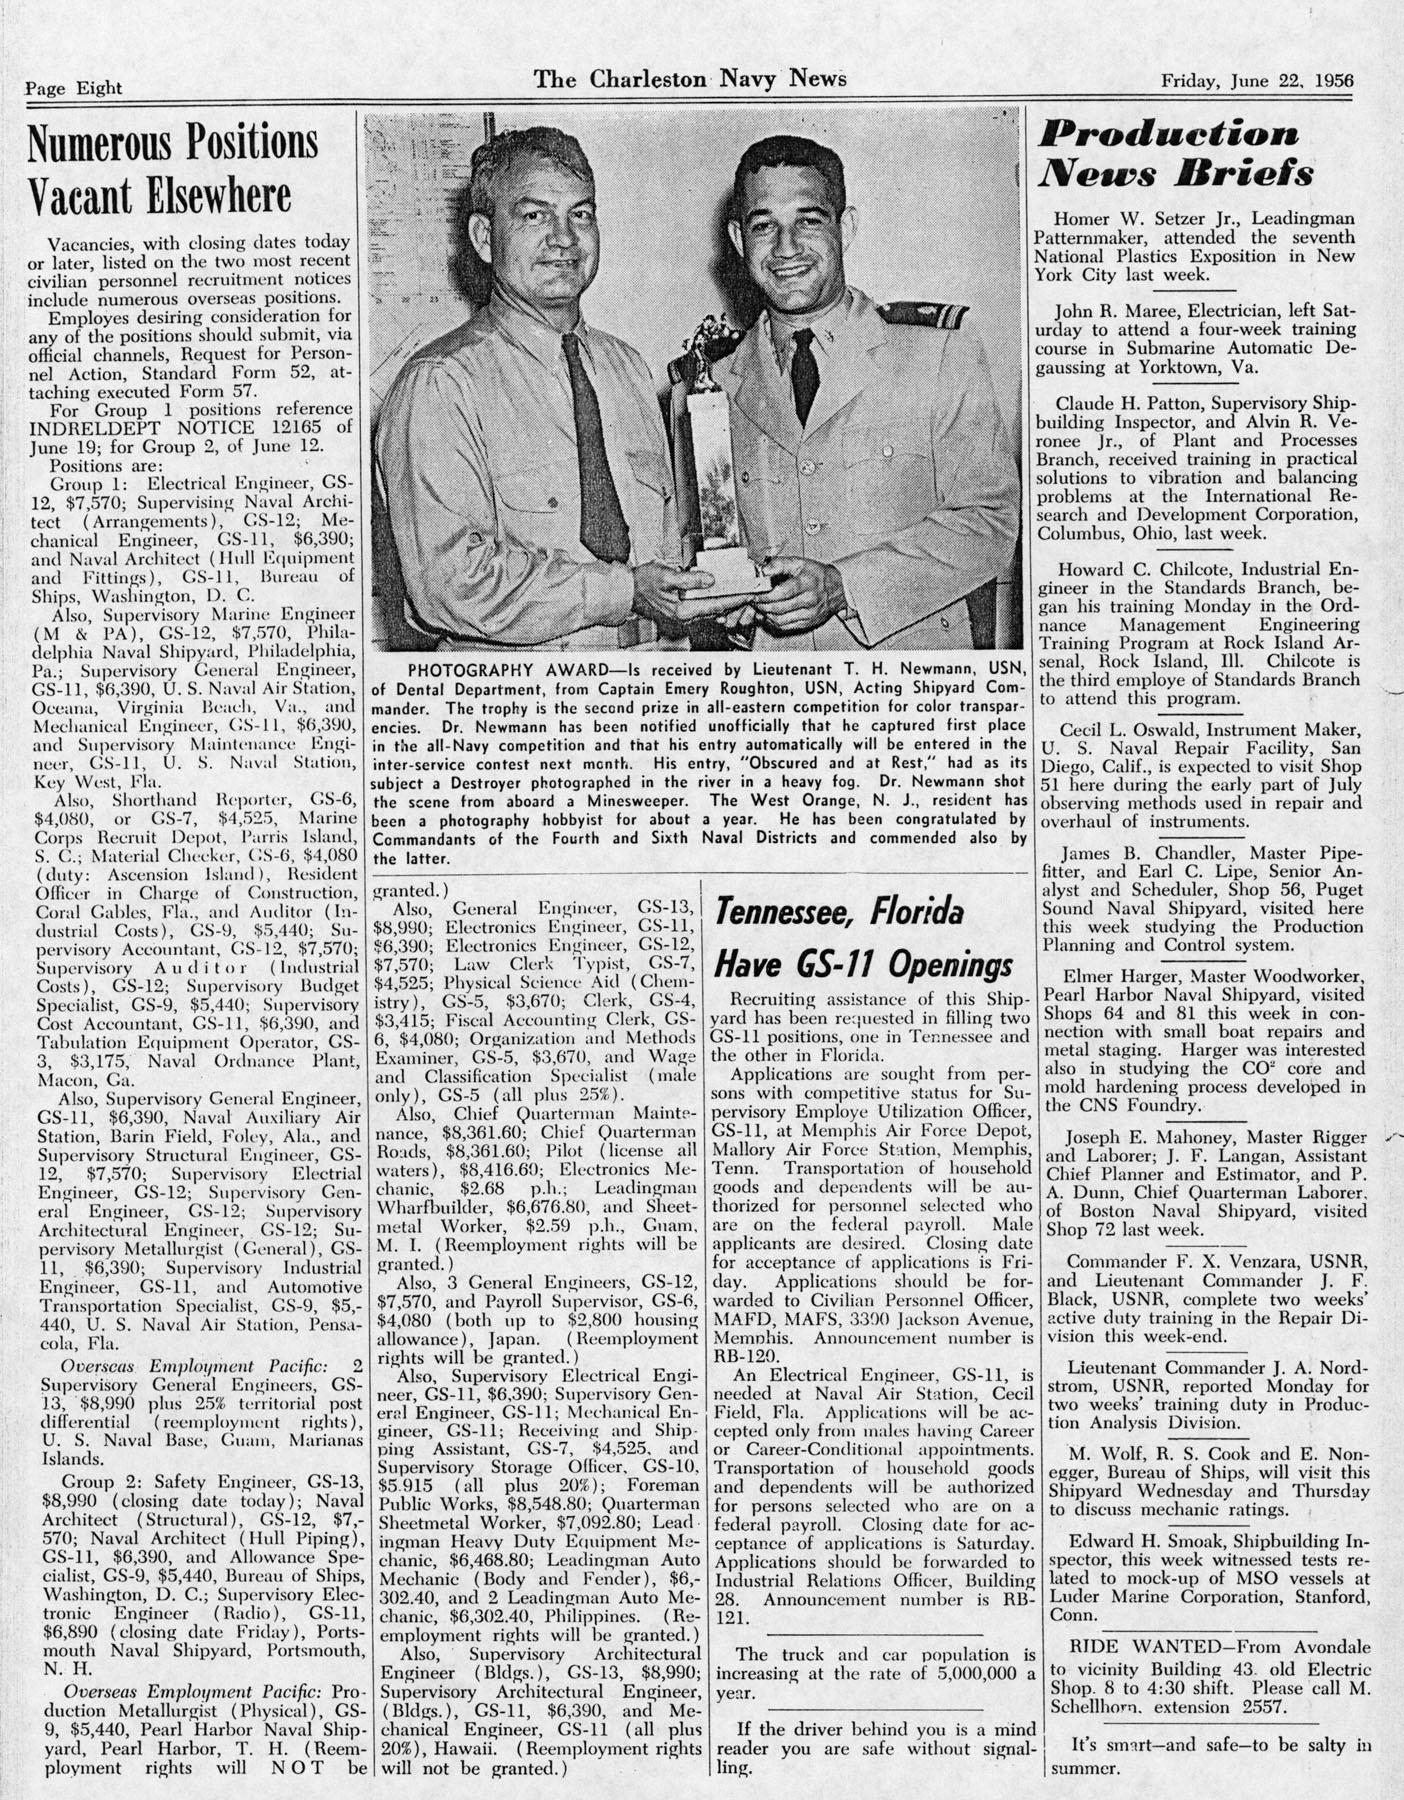 The Charleston Navy News, Volume 14, Edition 24, page viii